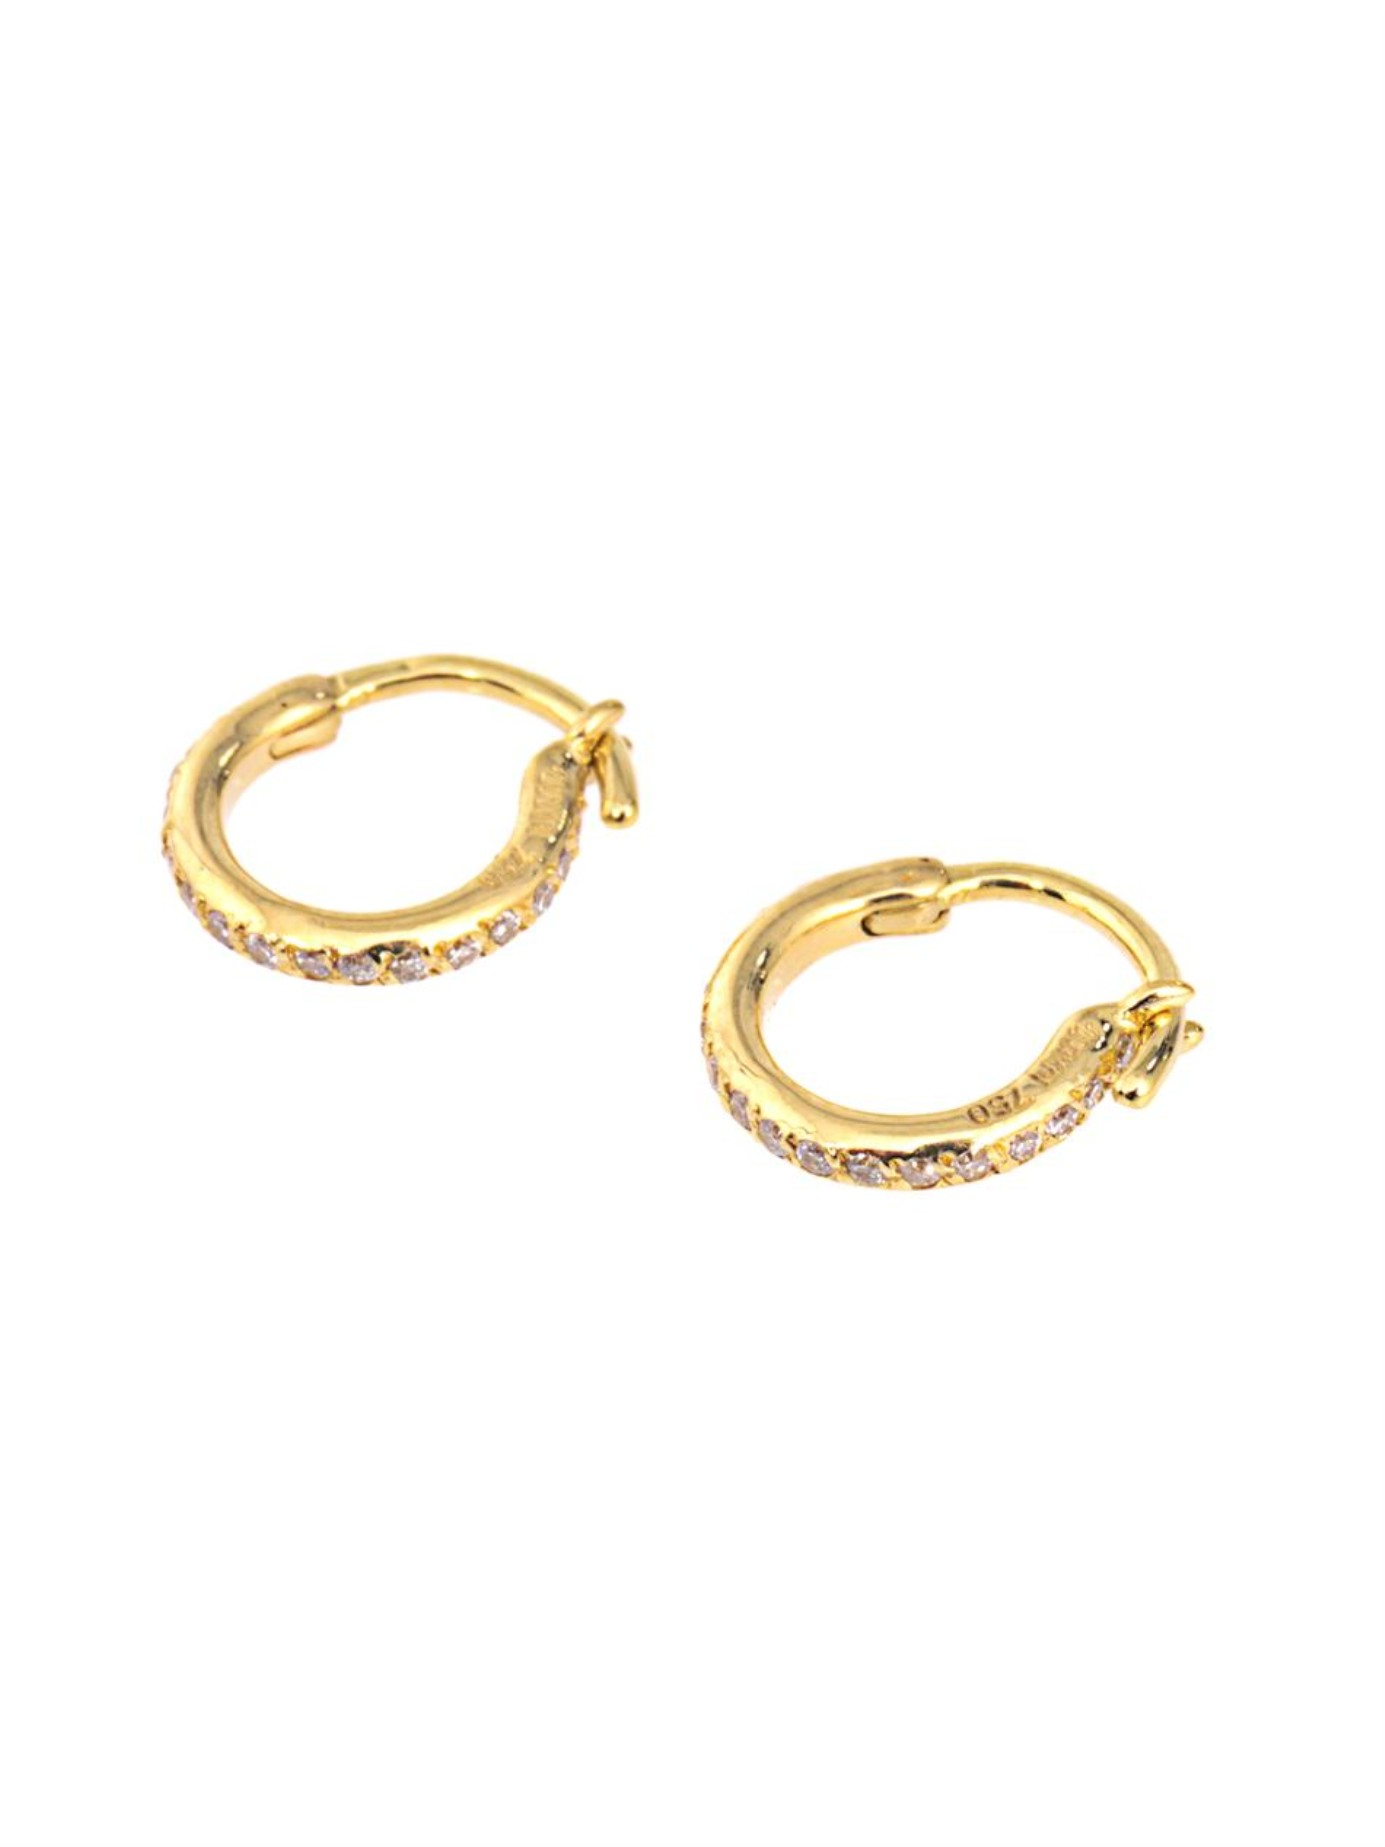 Diamond & yellow-gold earrings Ileana Makri mRfb9IlwG